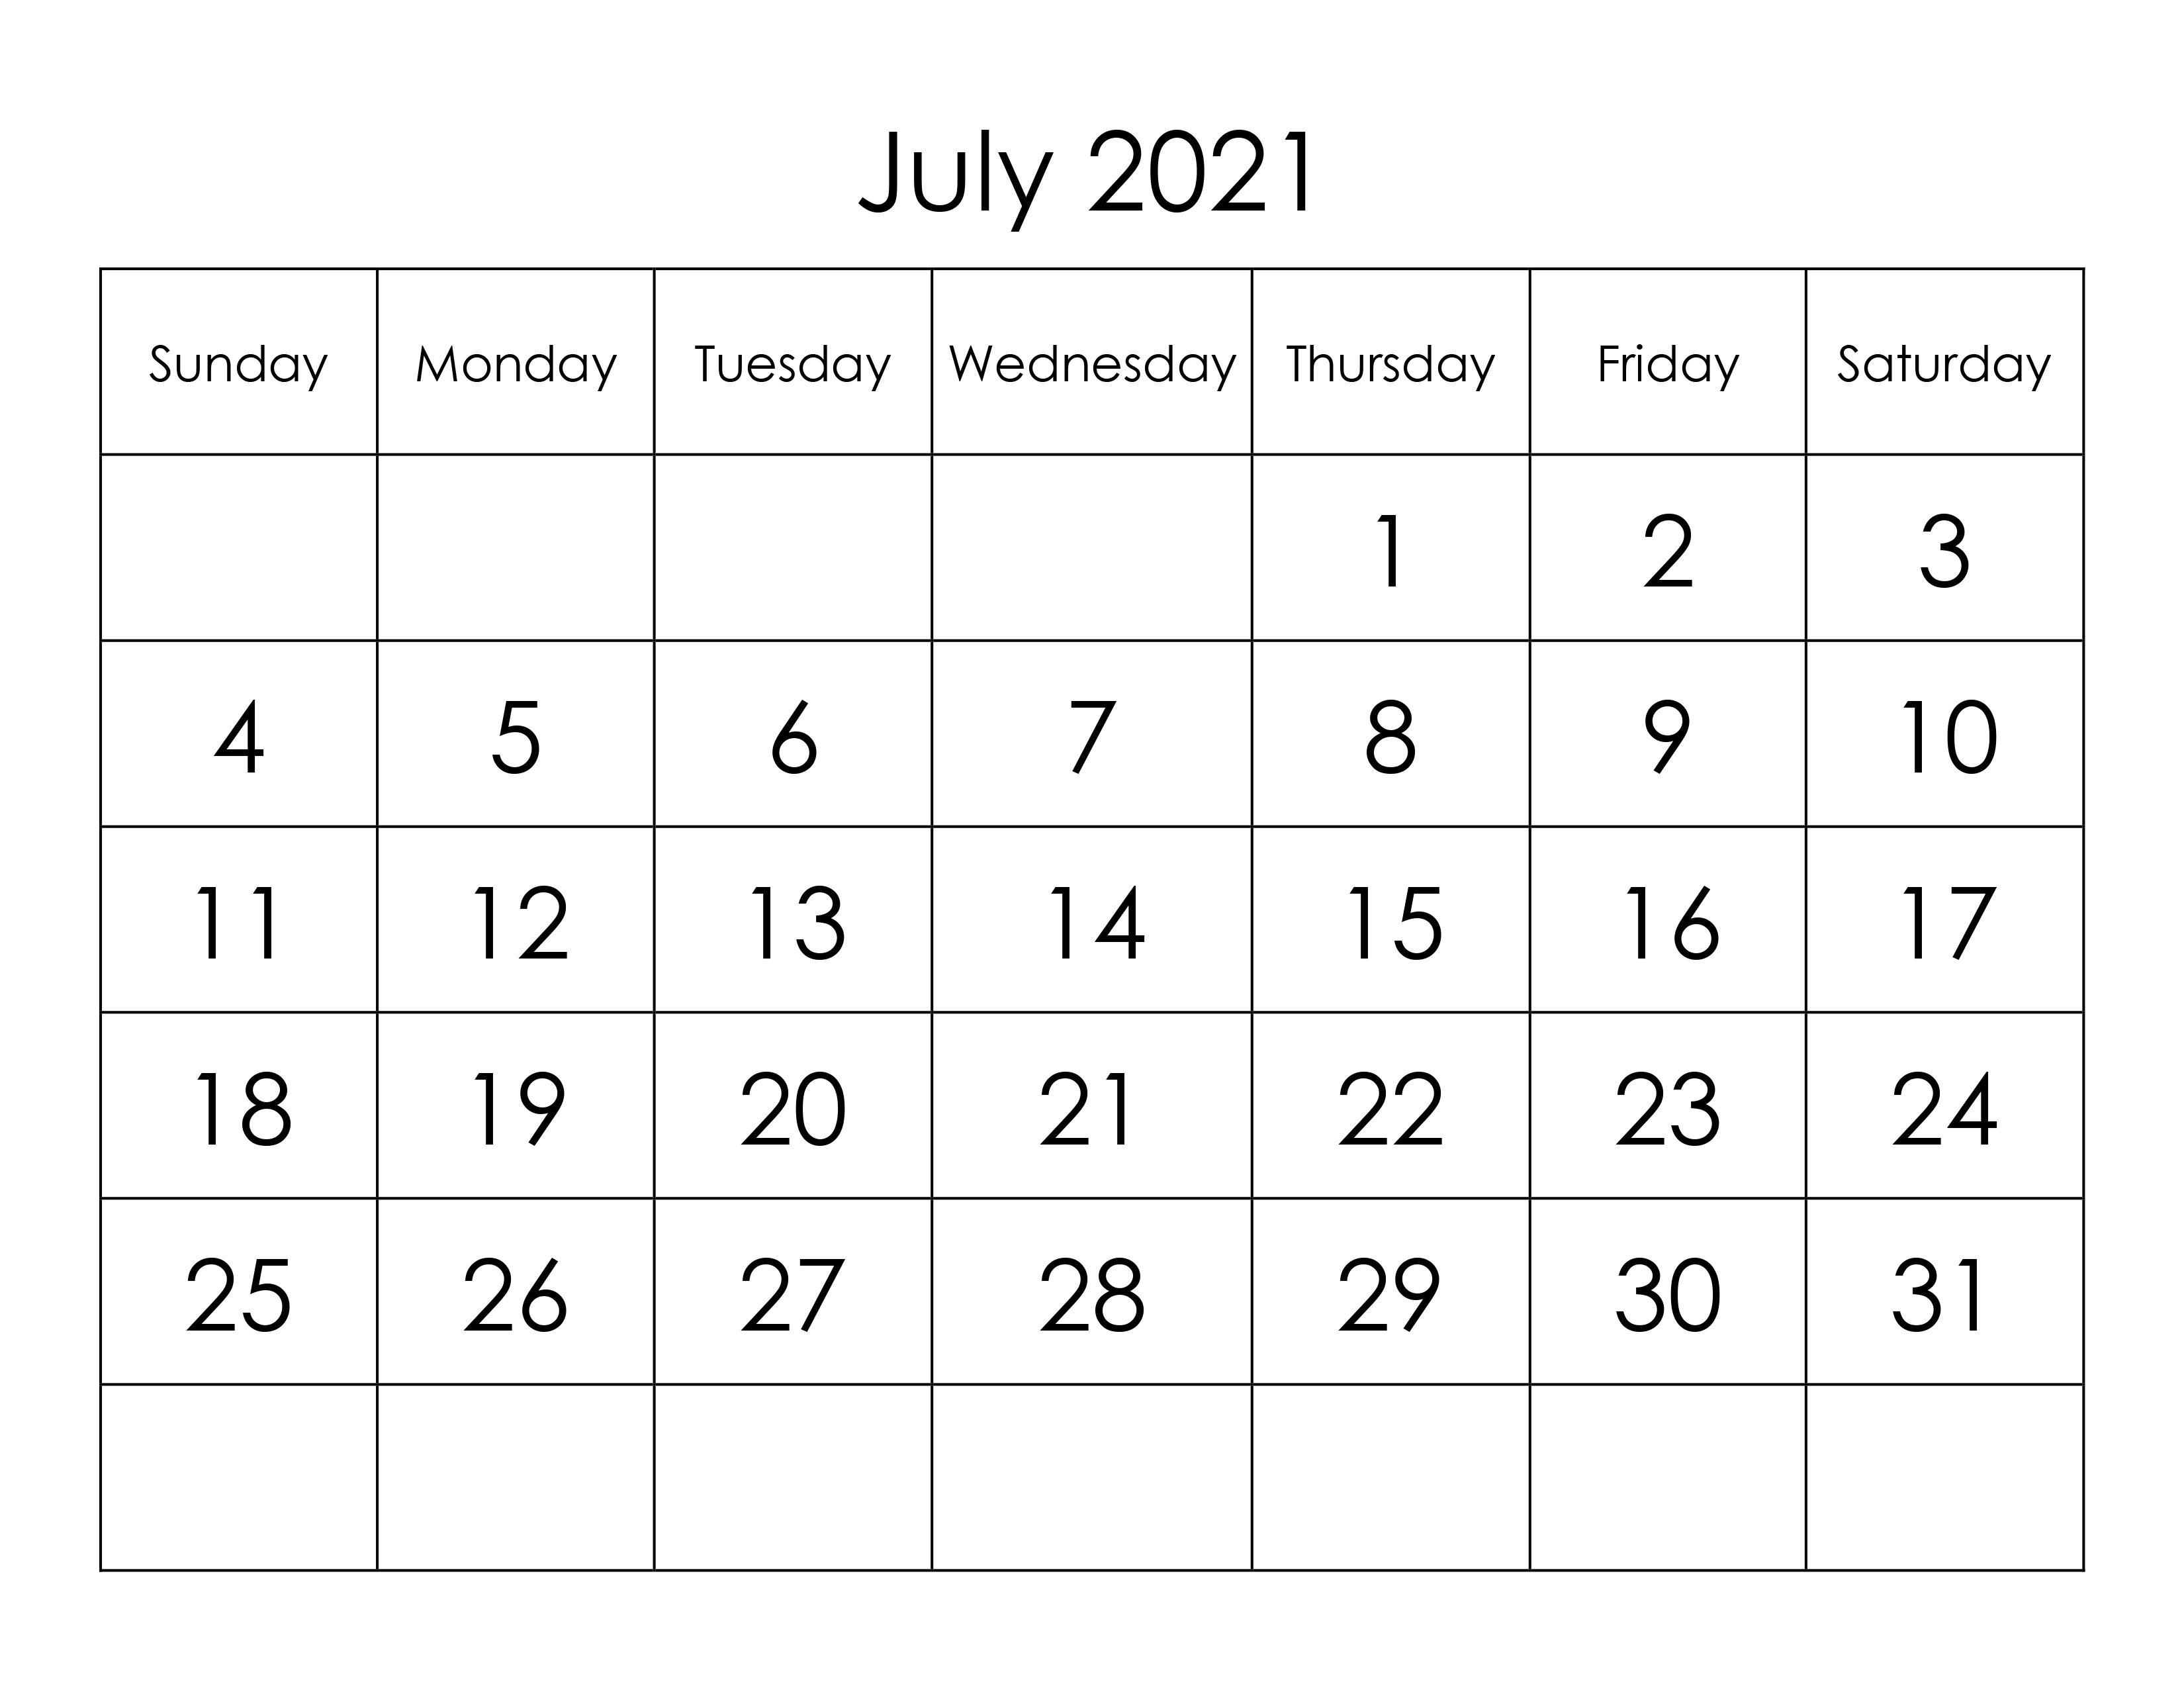 Calendar For July 2021 - Free-Calendar.su July 2021 Calendar Vertical